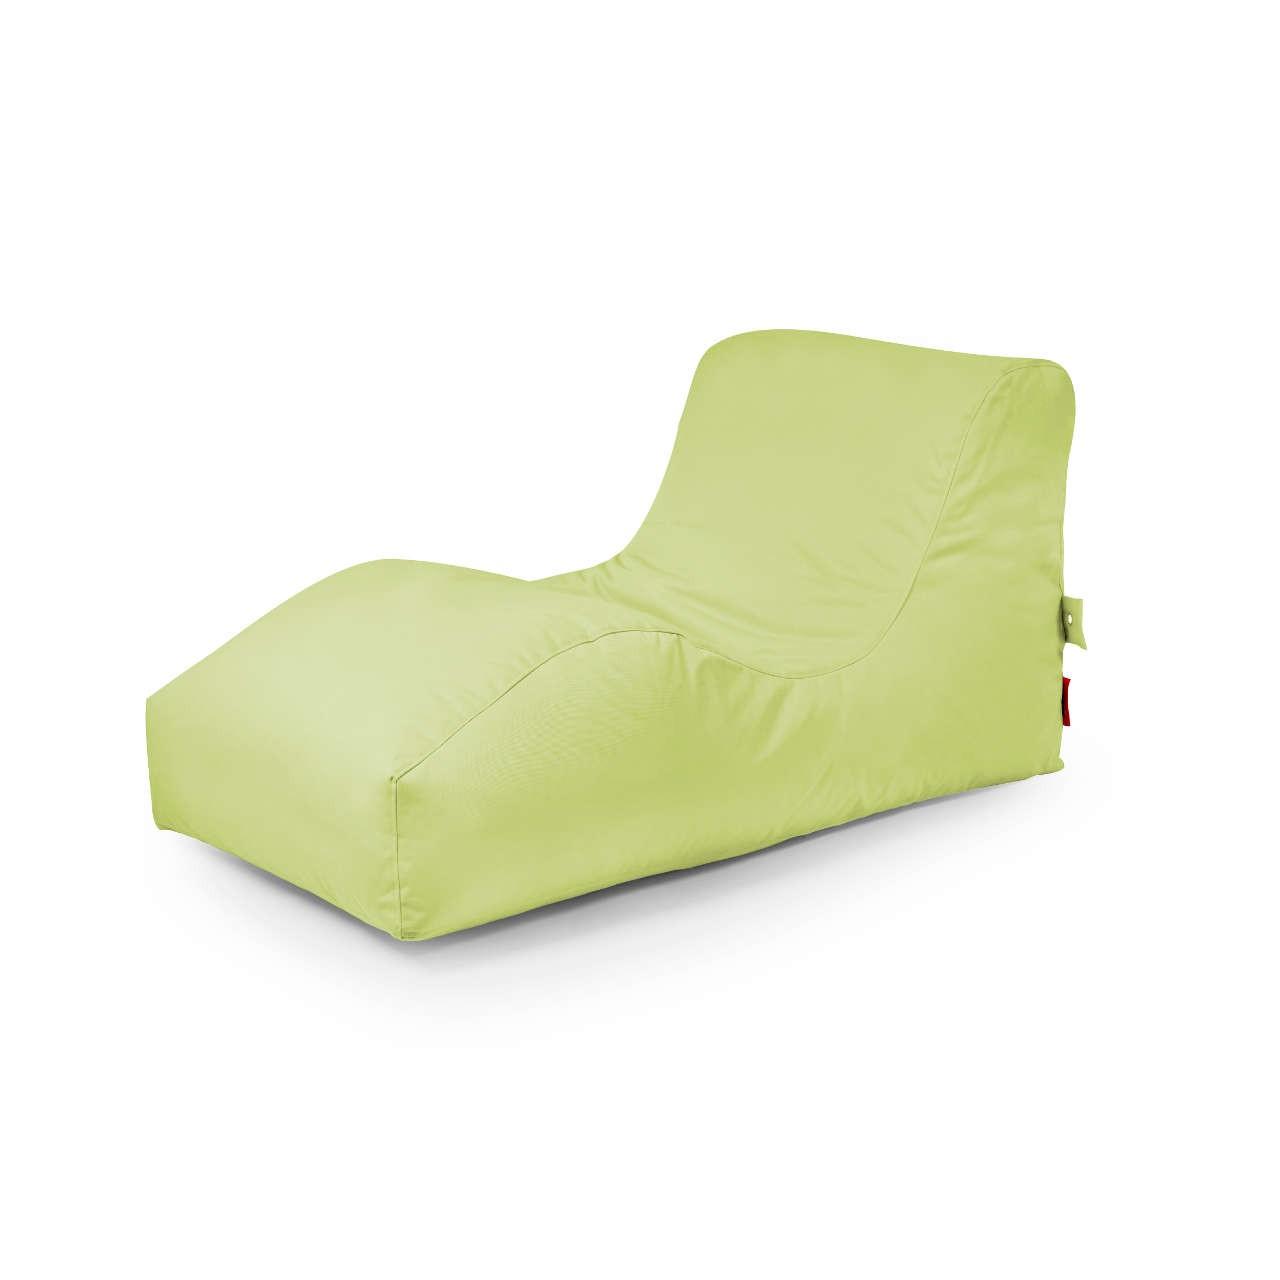 Outbag Sitzsack Wave 01WAVPLU-lim plus lime